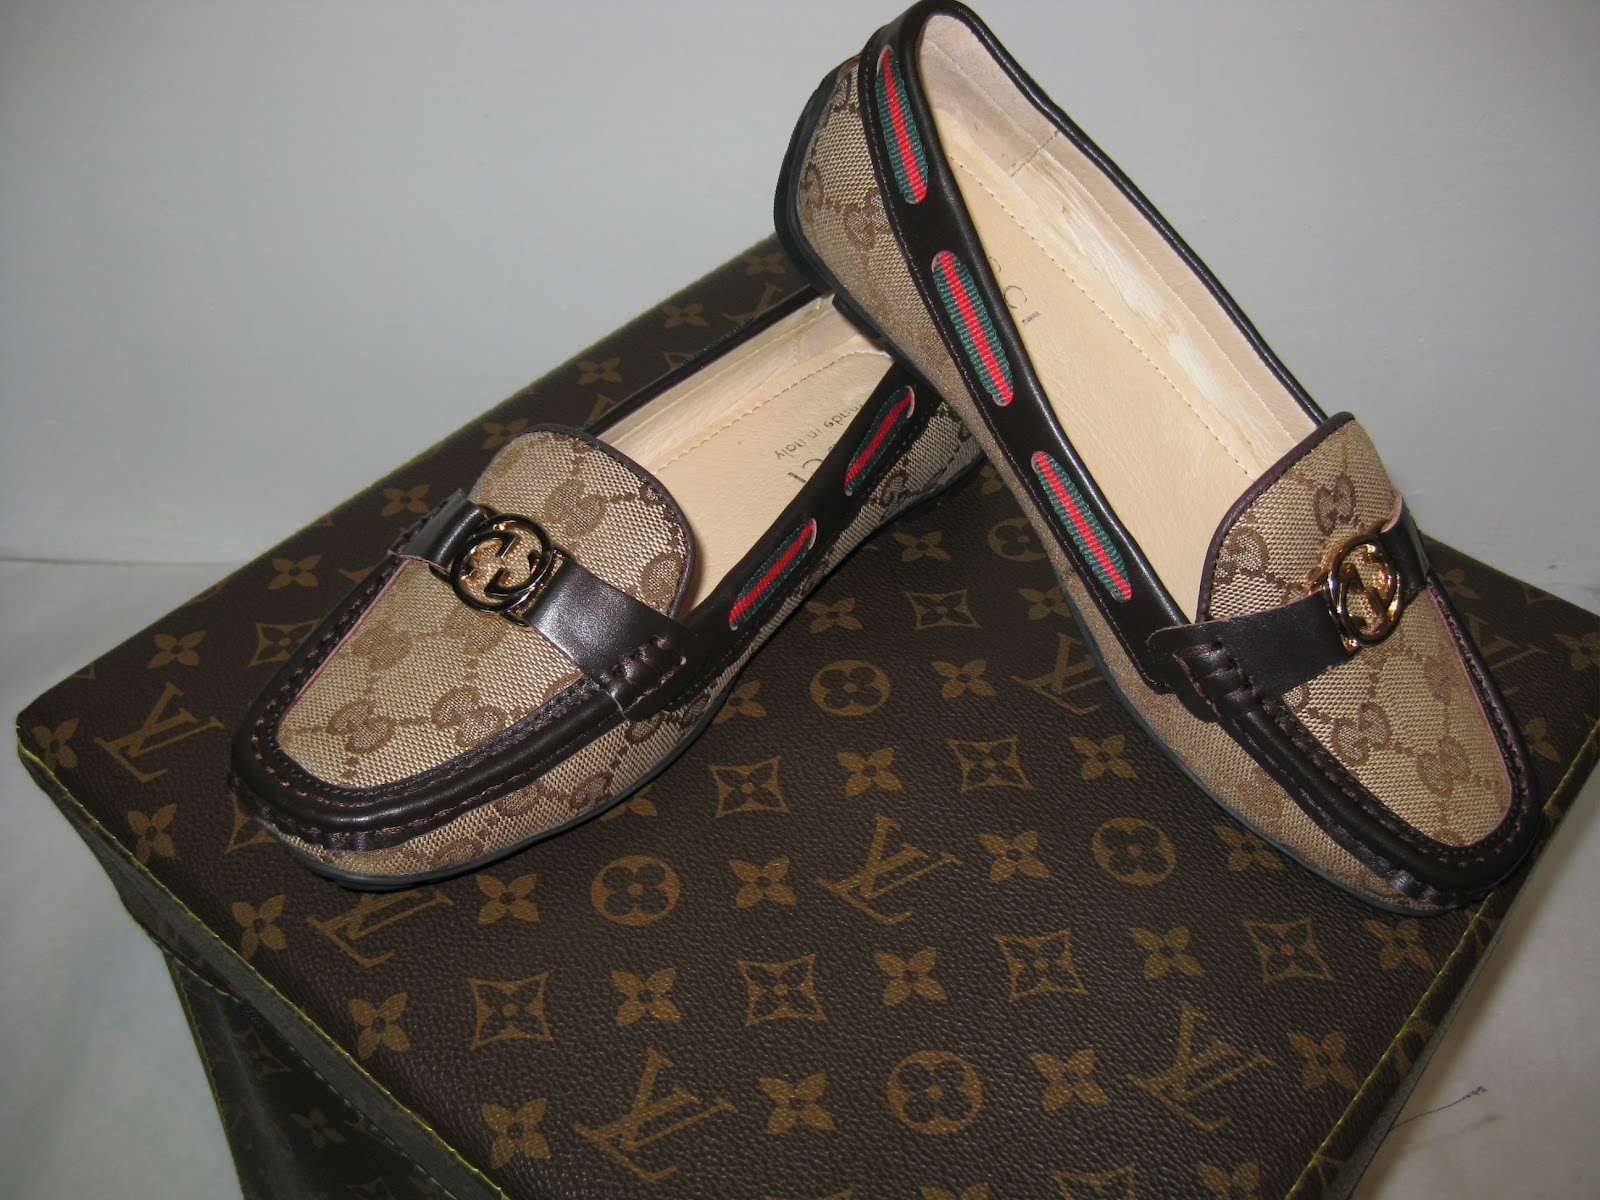 28b1b0cff6c1f Zapatos Louis Vuitton Mujer Mocasines www.artofmikemignola.com